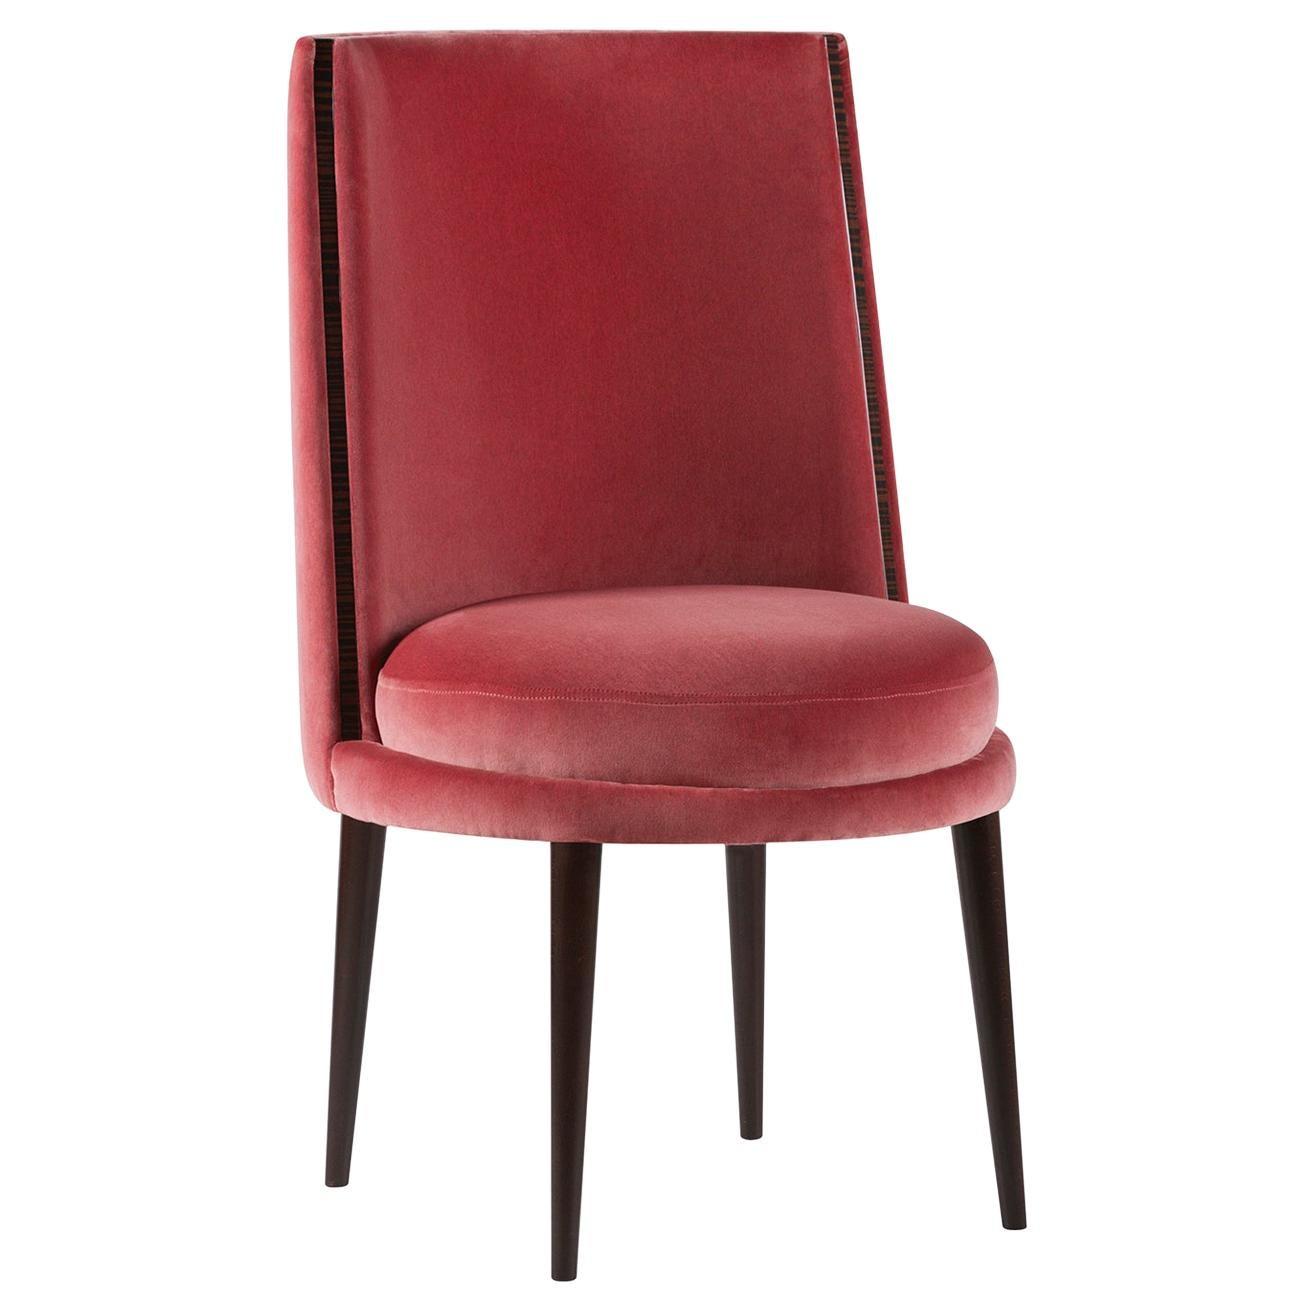 De Castro Chair Beech Dark Brown Stain Ruby Pink Cotton Velvet Ebony